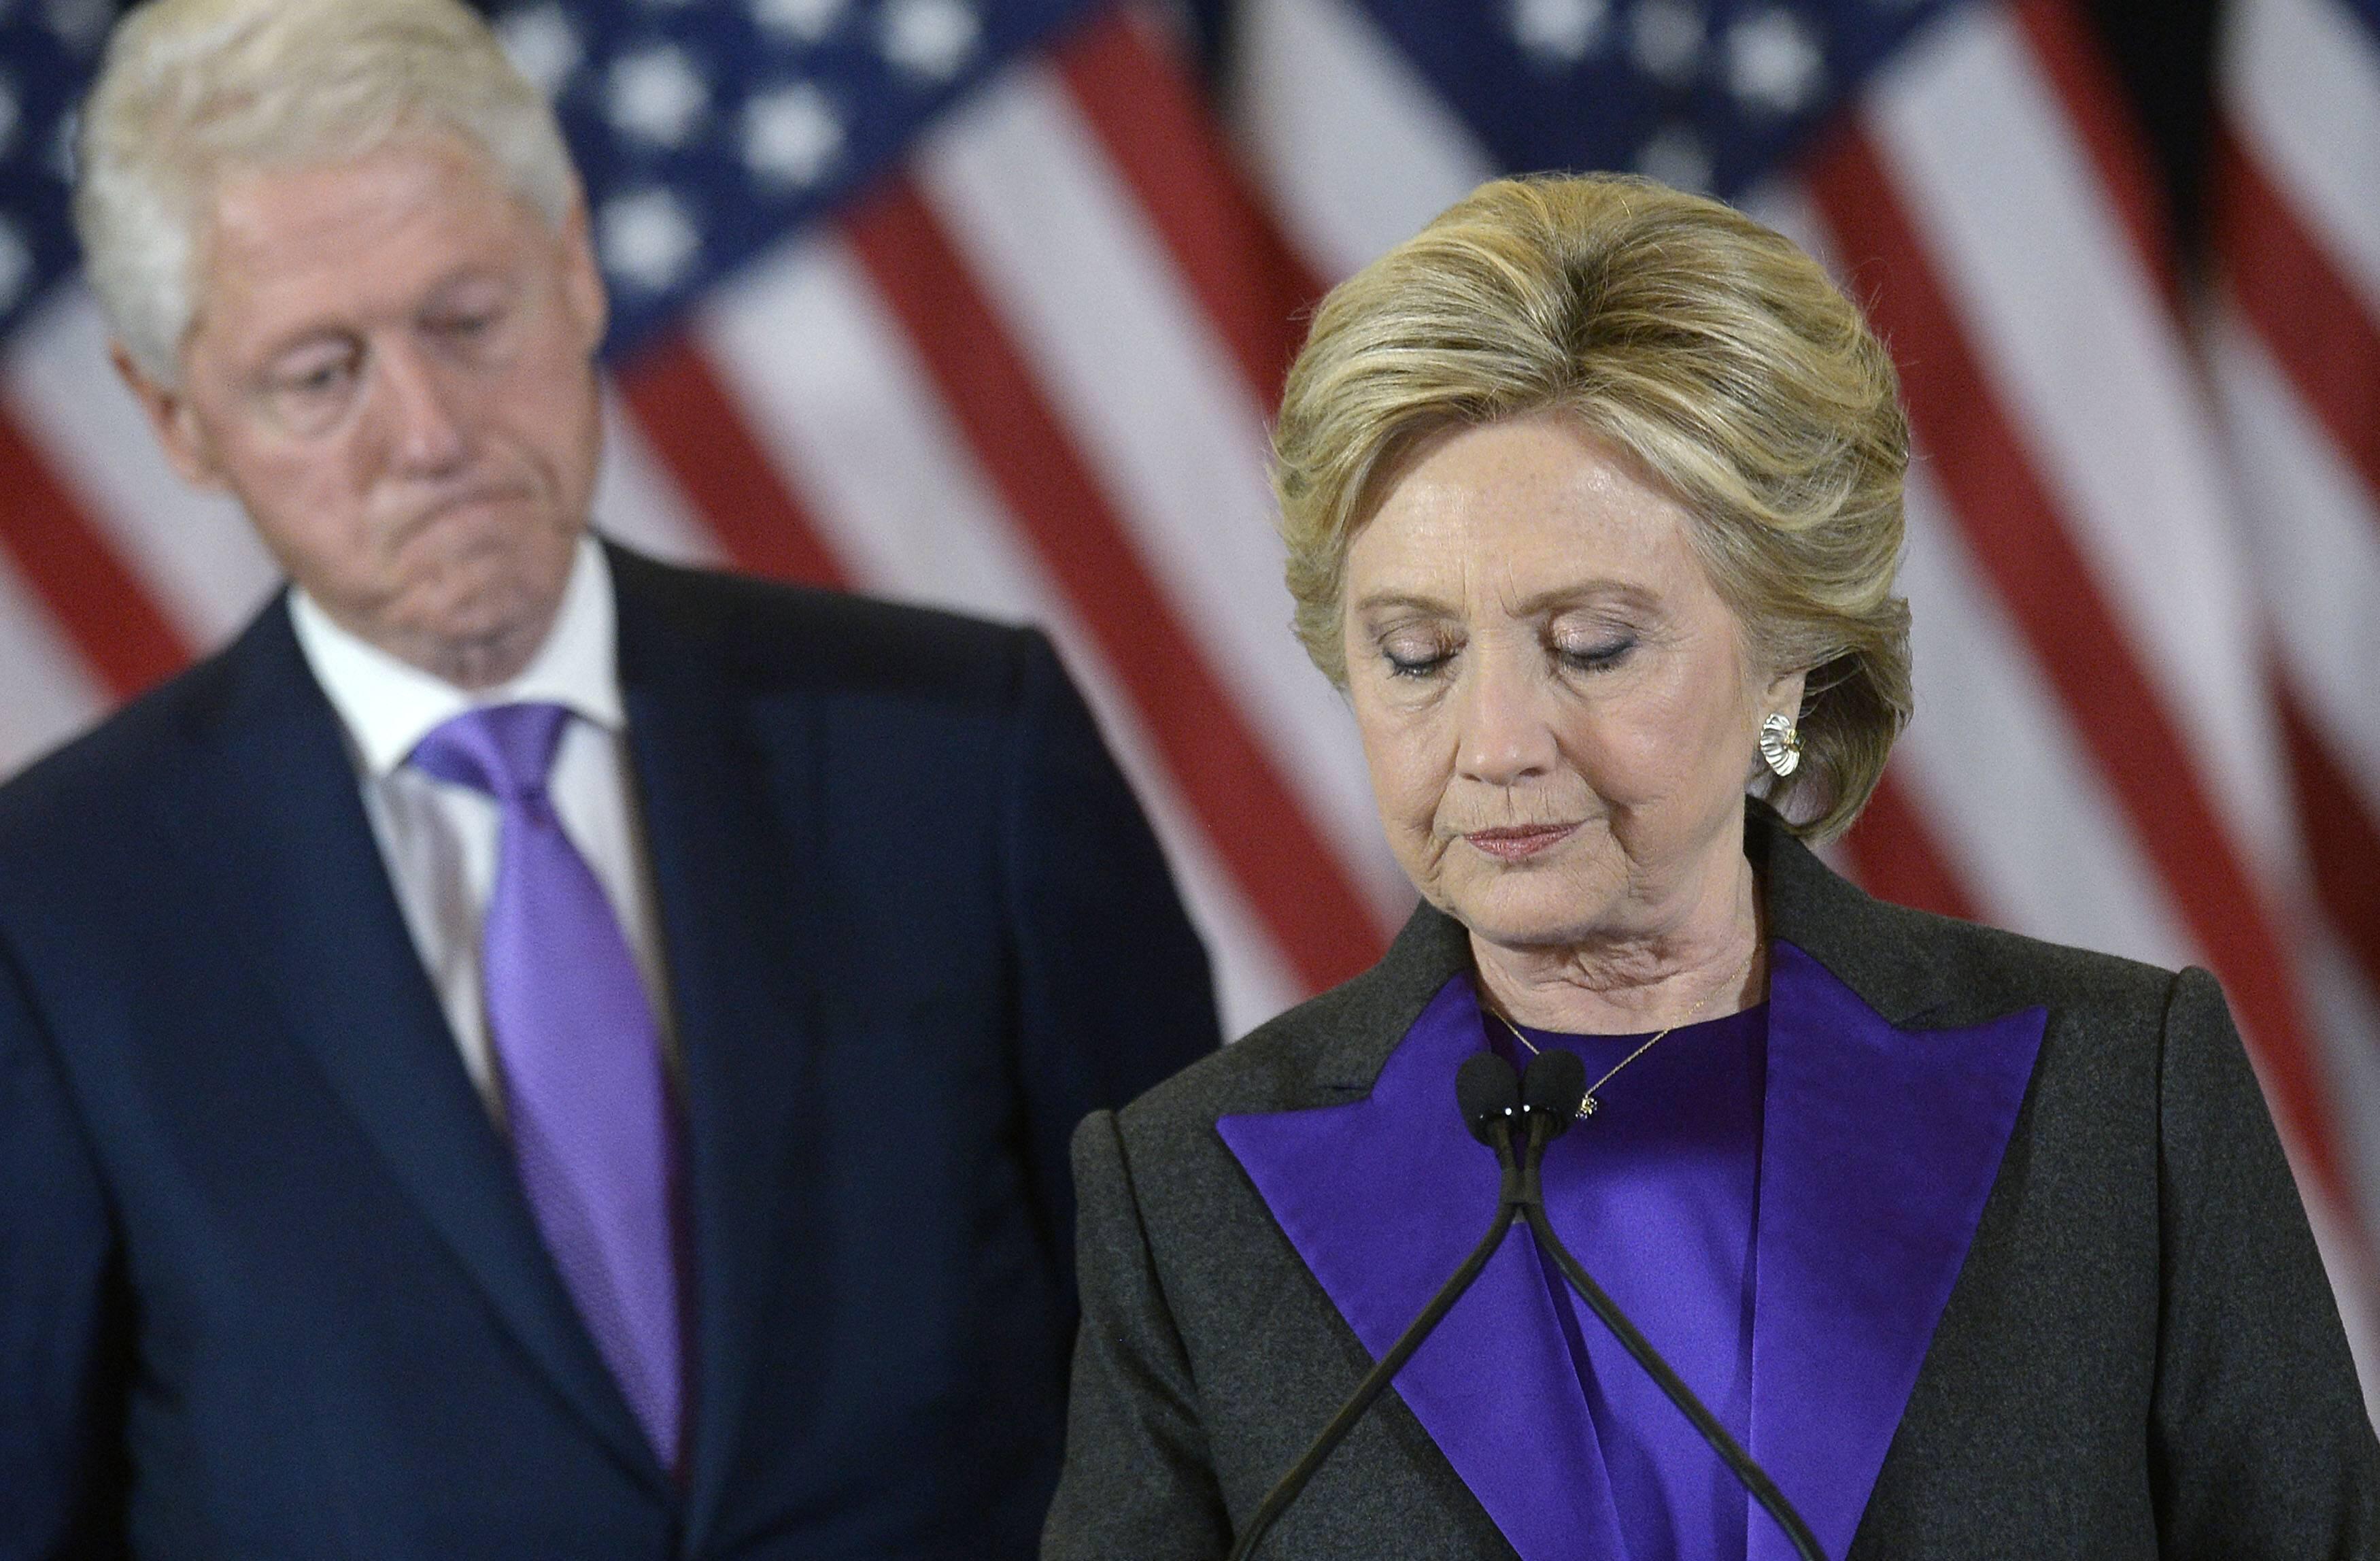 Bild zu US-Wahl, Donald Trump, Hillary Clinton, Folgen